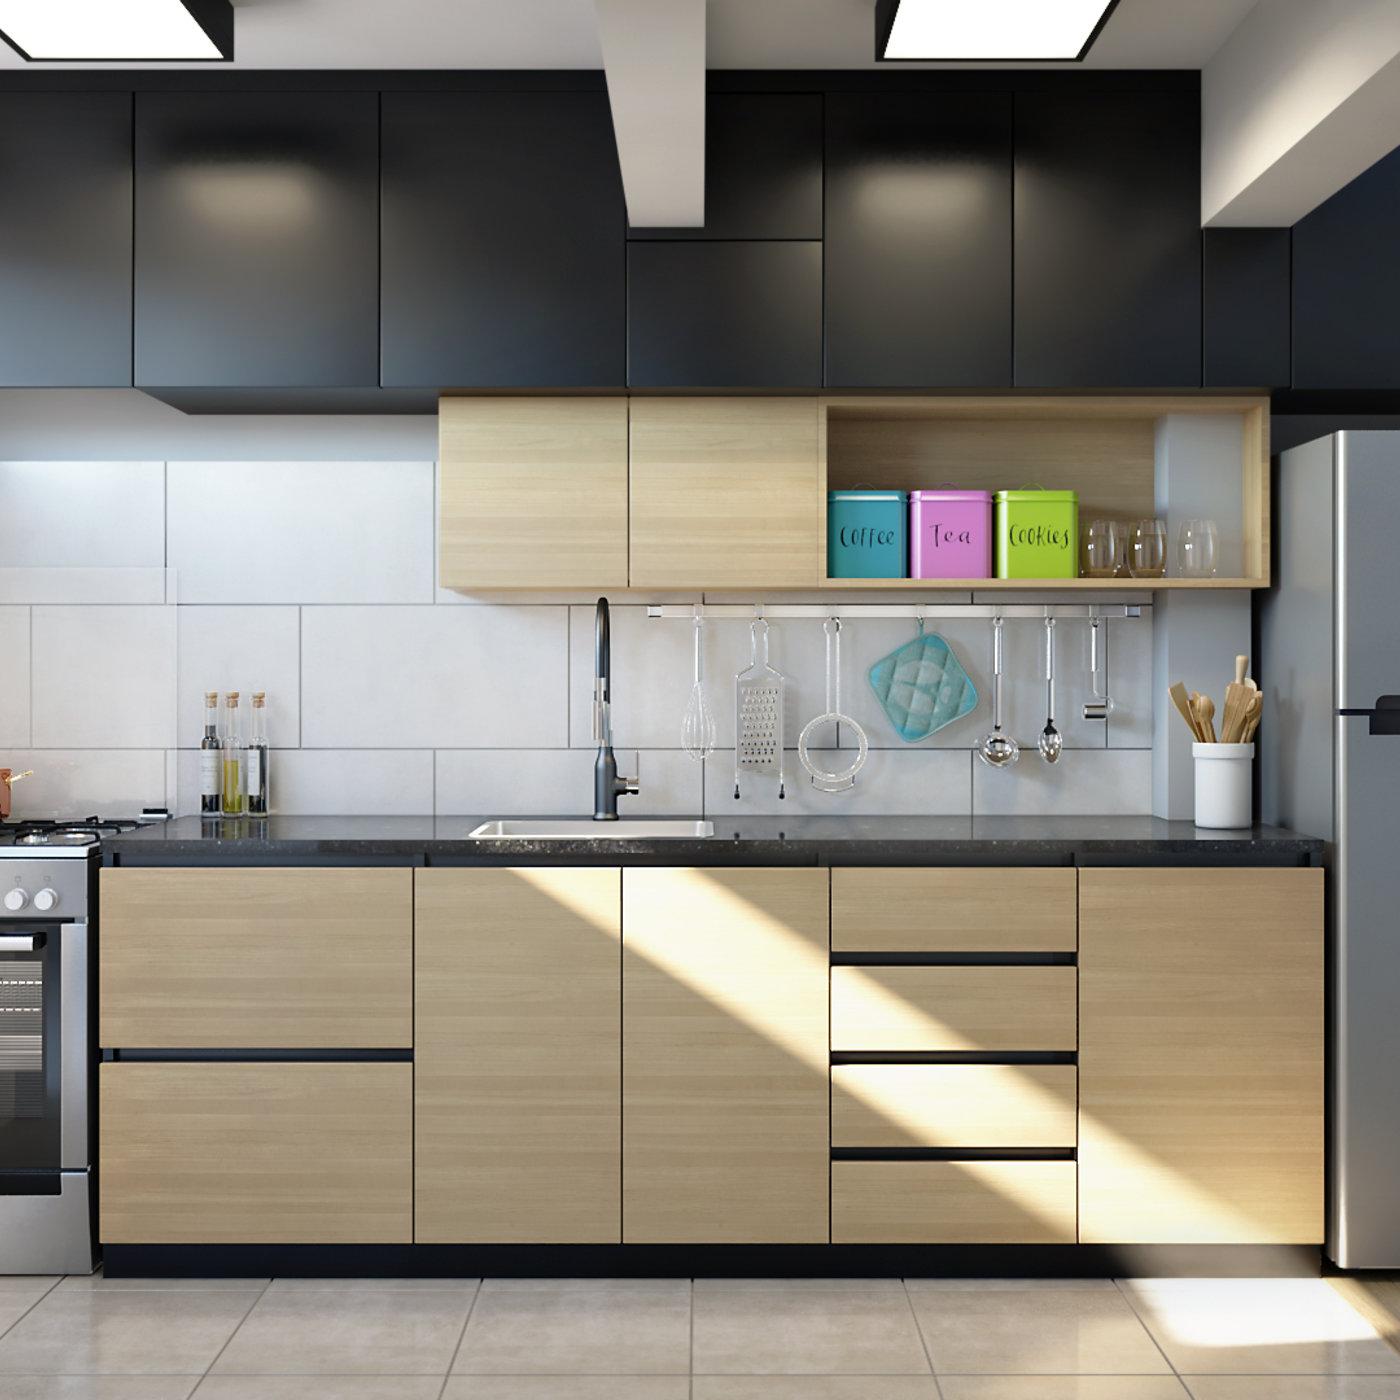 Kitchen - Residential Visualization